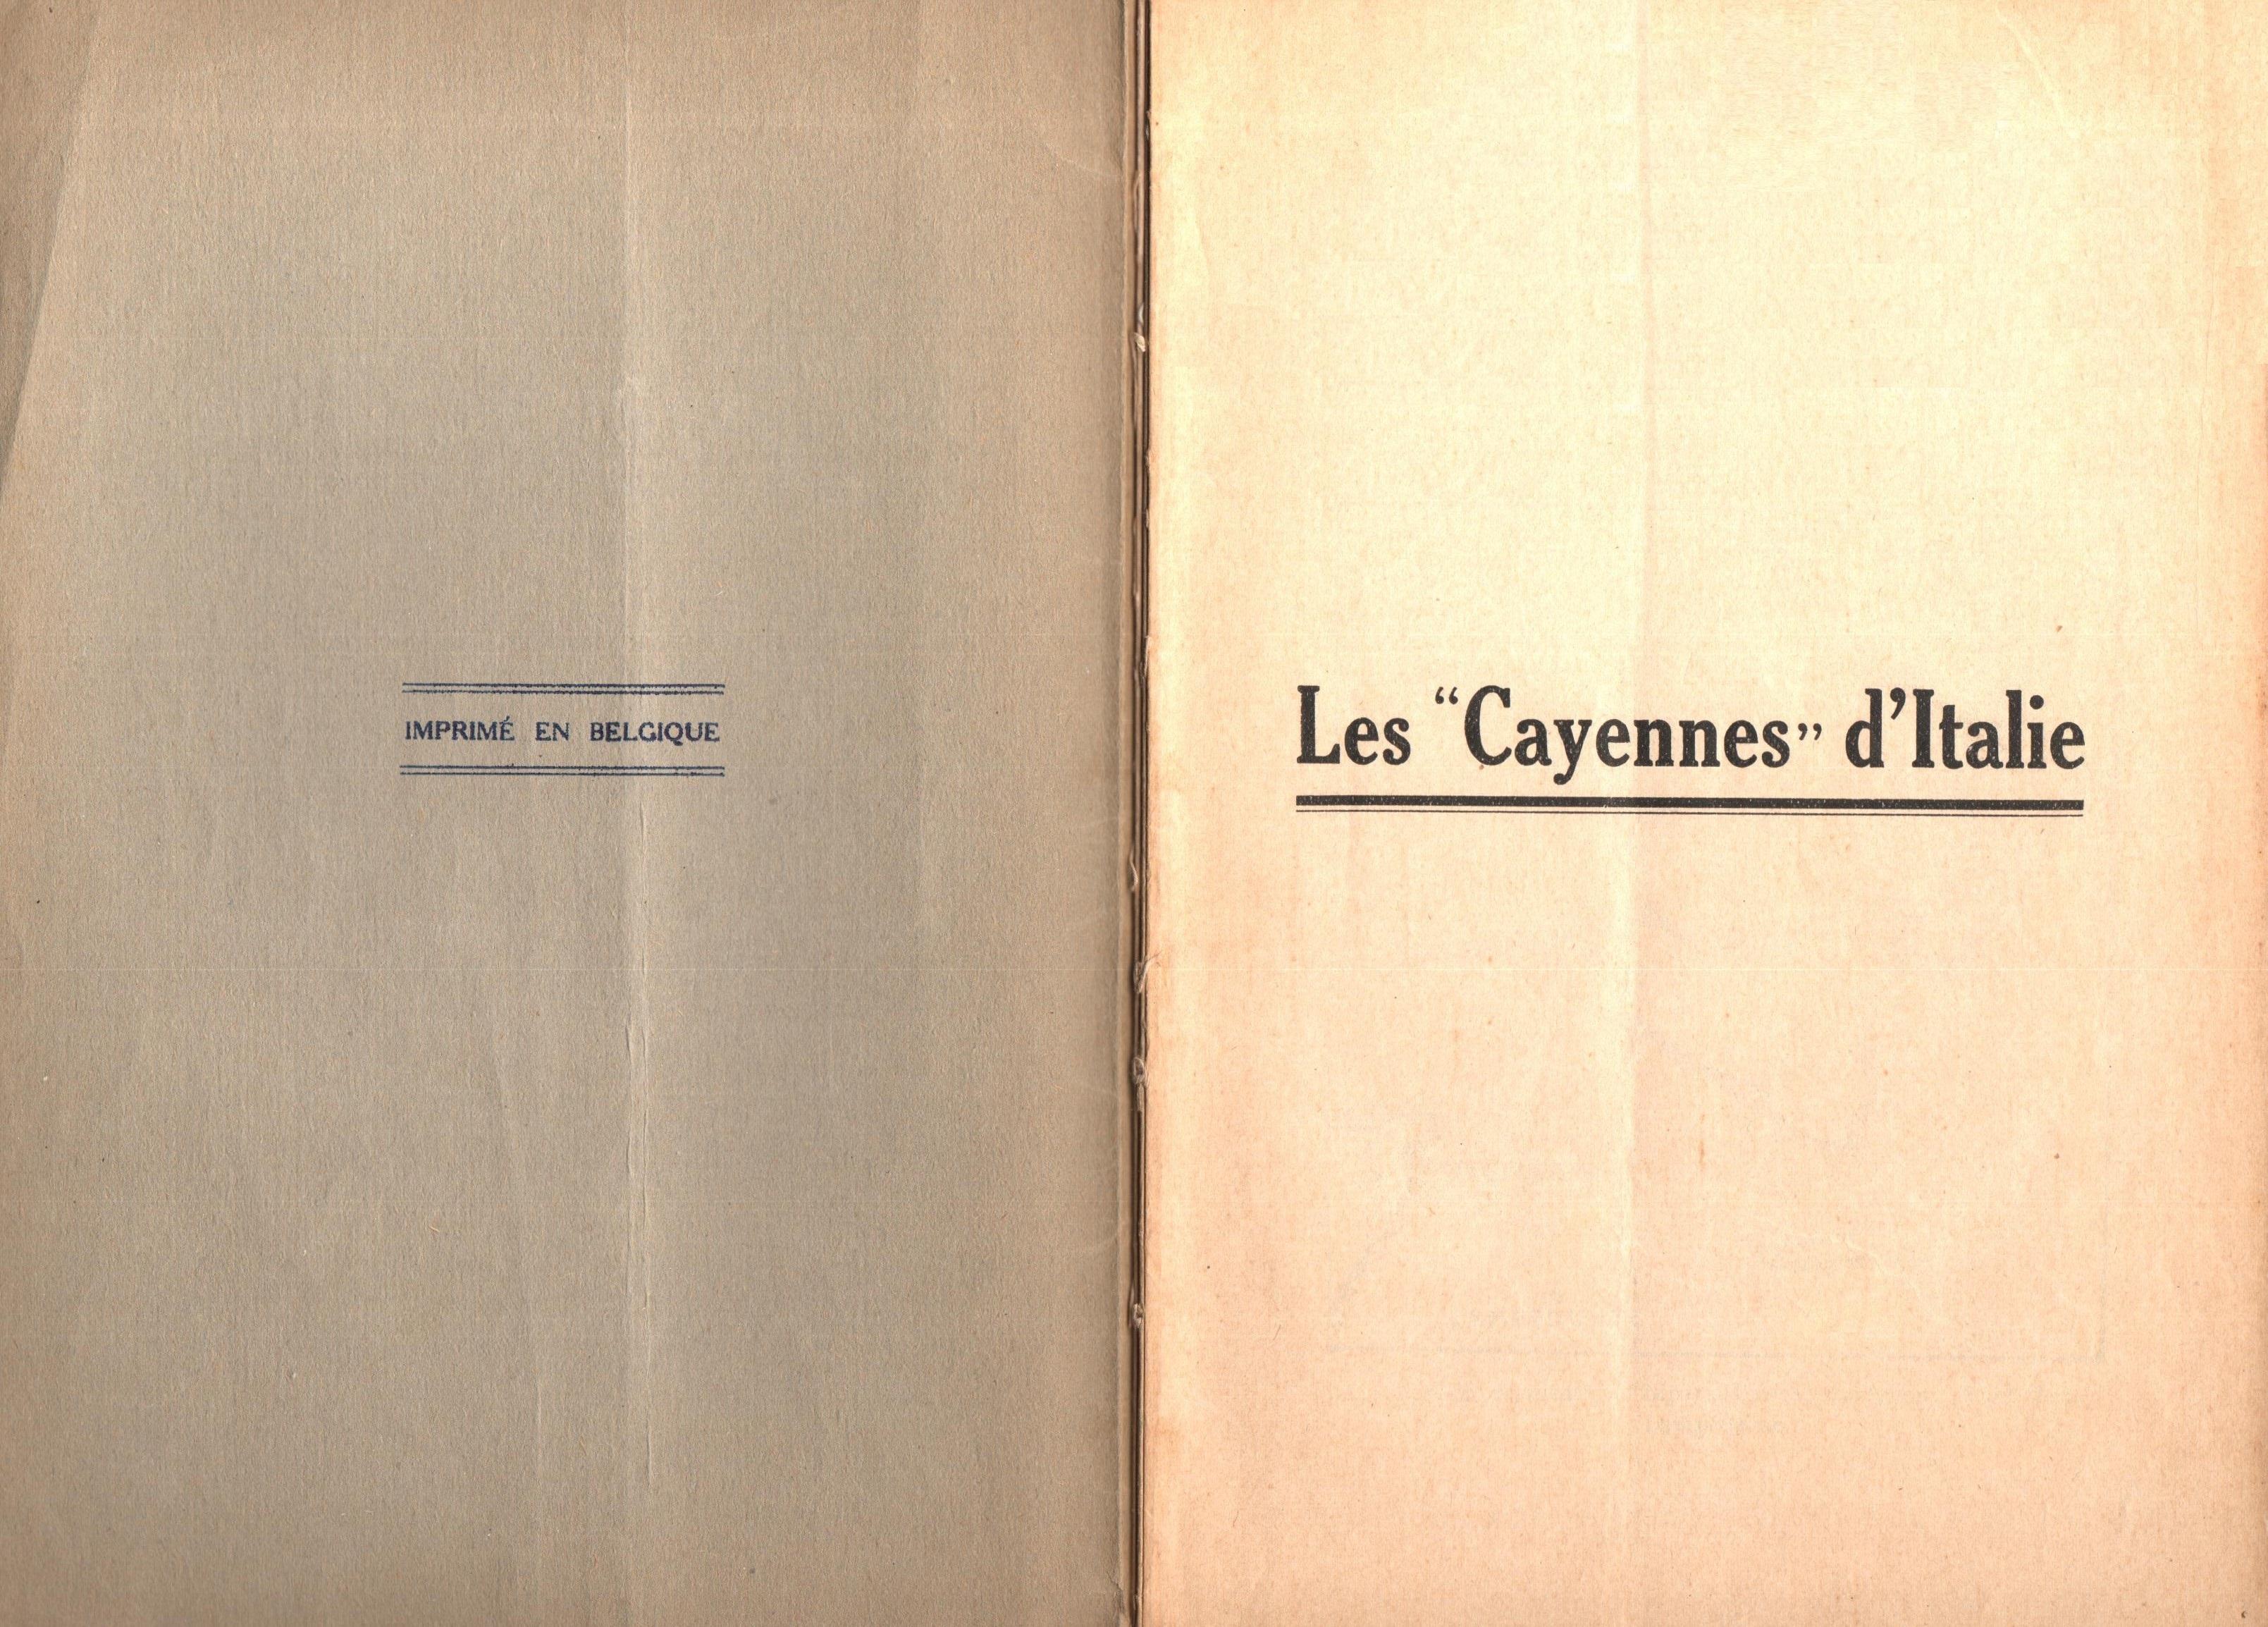 Nicola Cilla, Les «Cayennes» d'Italie - pag. 2